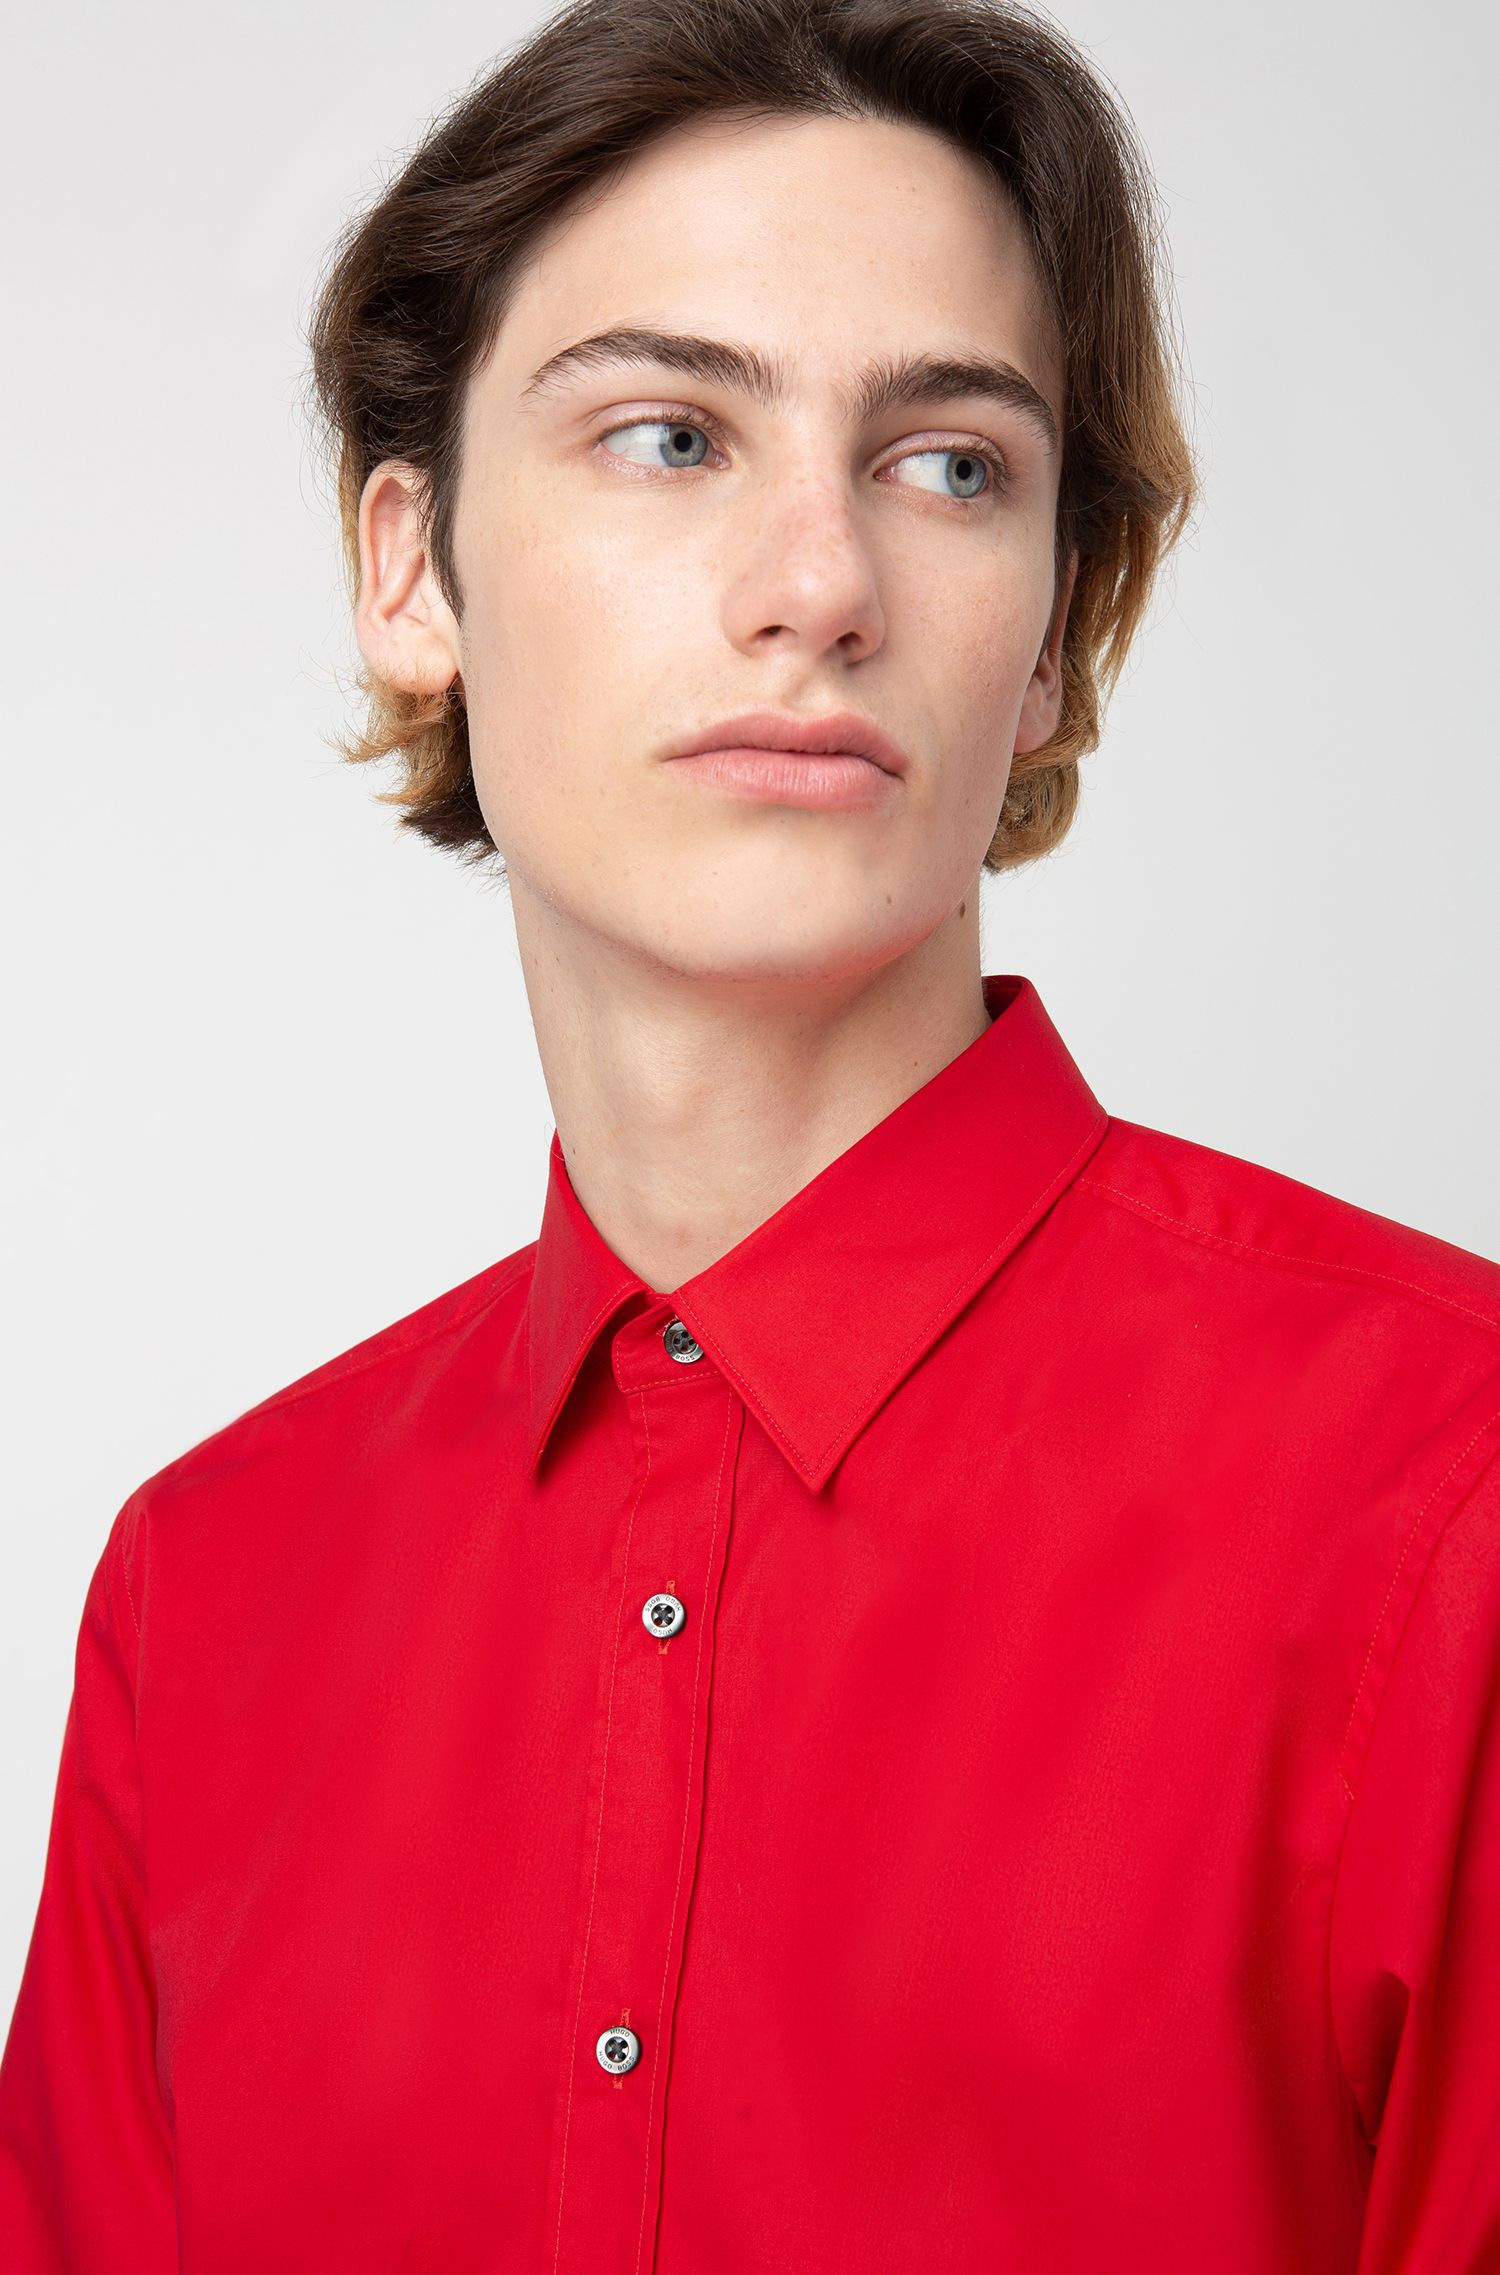 Chemise Extra Slim Fit en coton stretch, Rouge